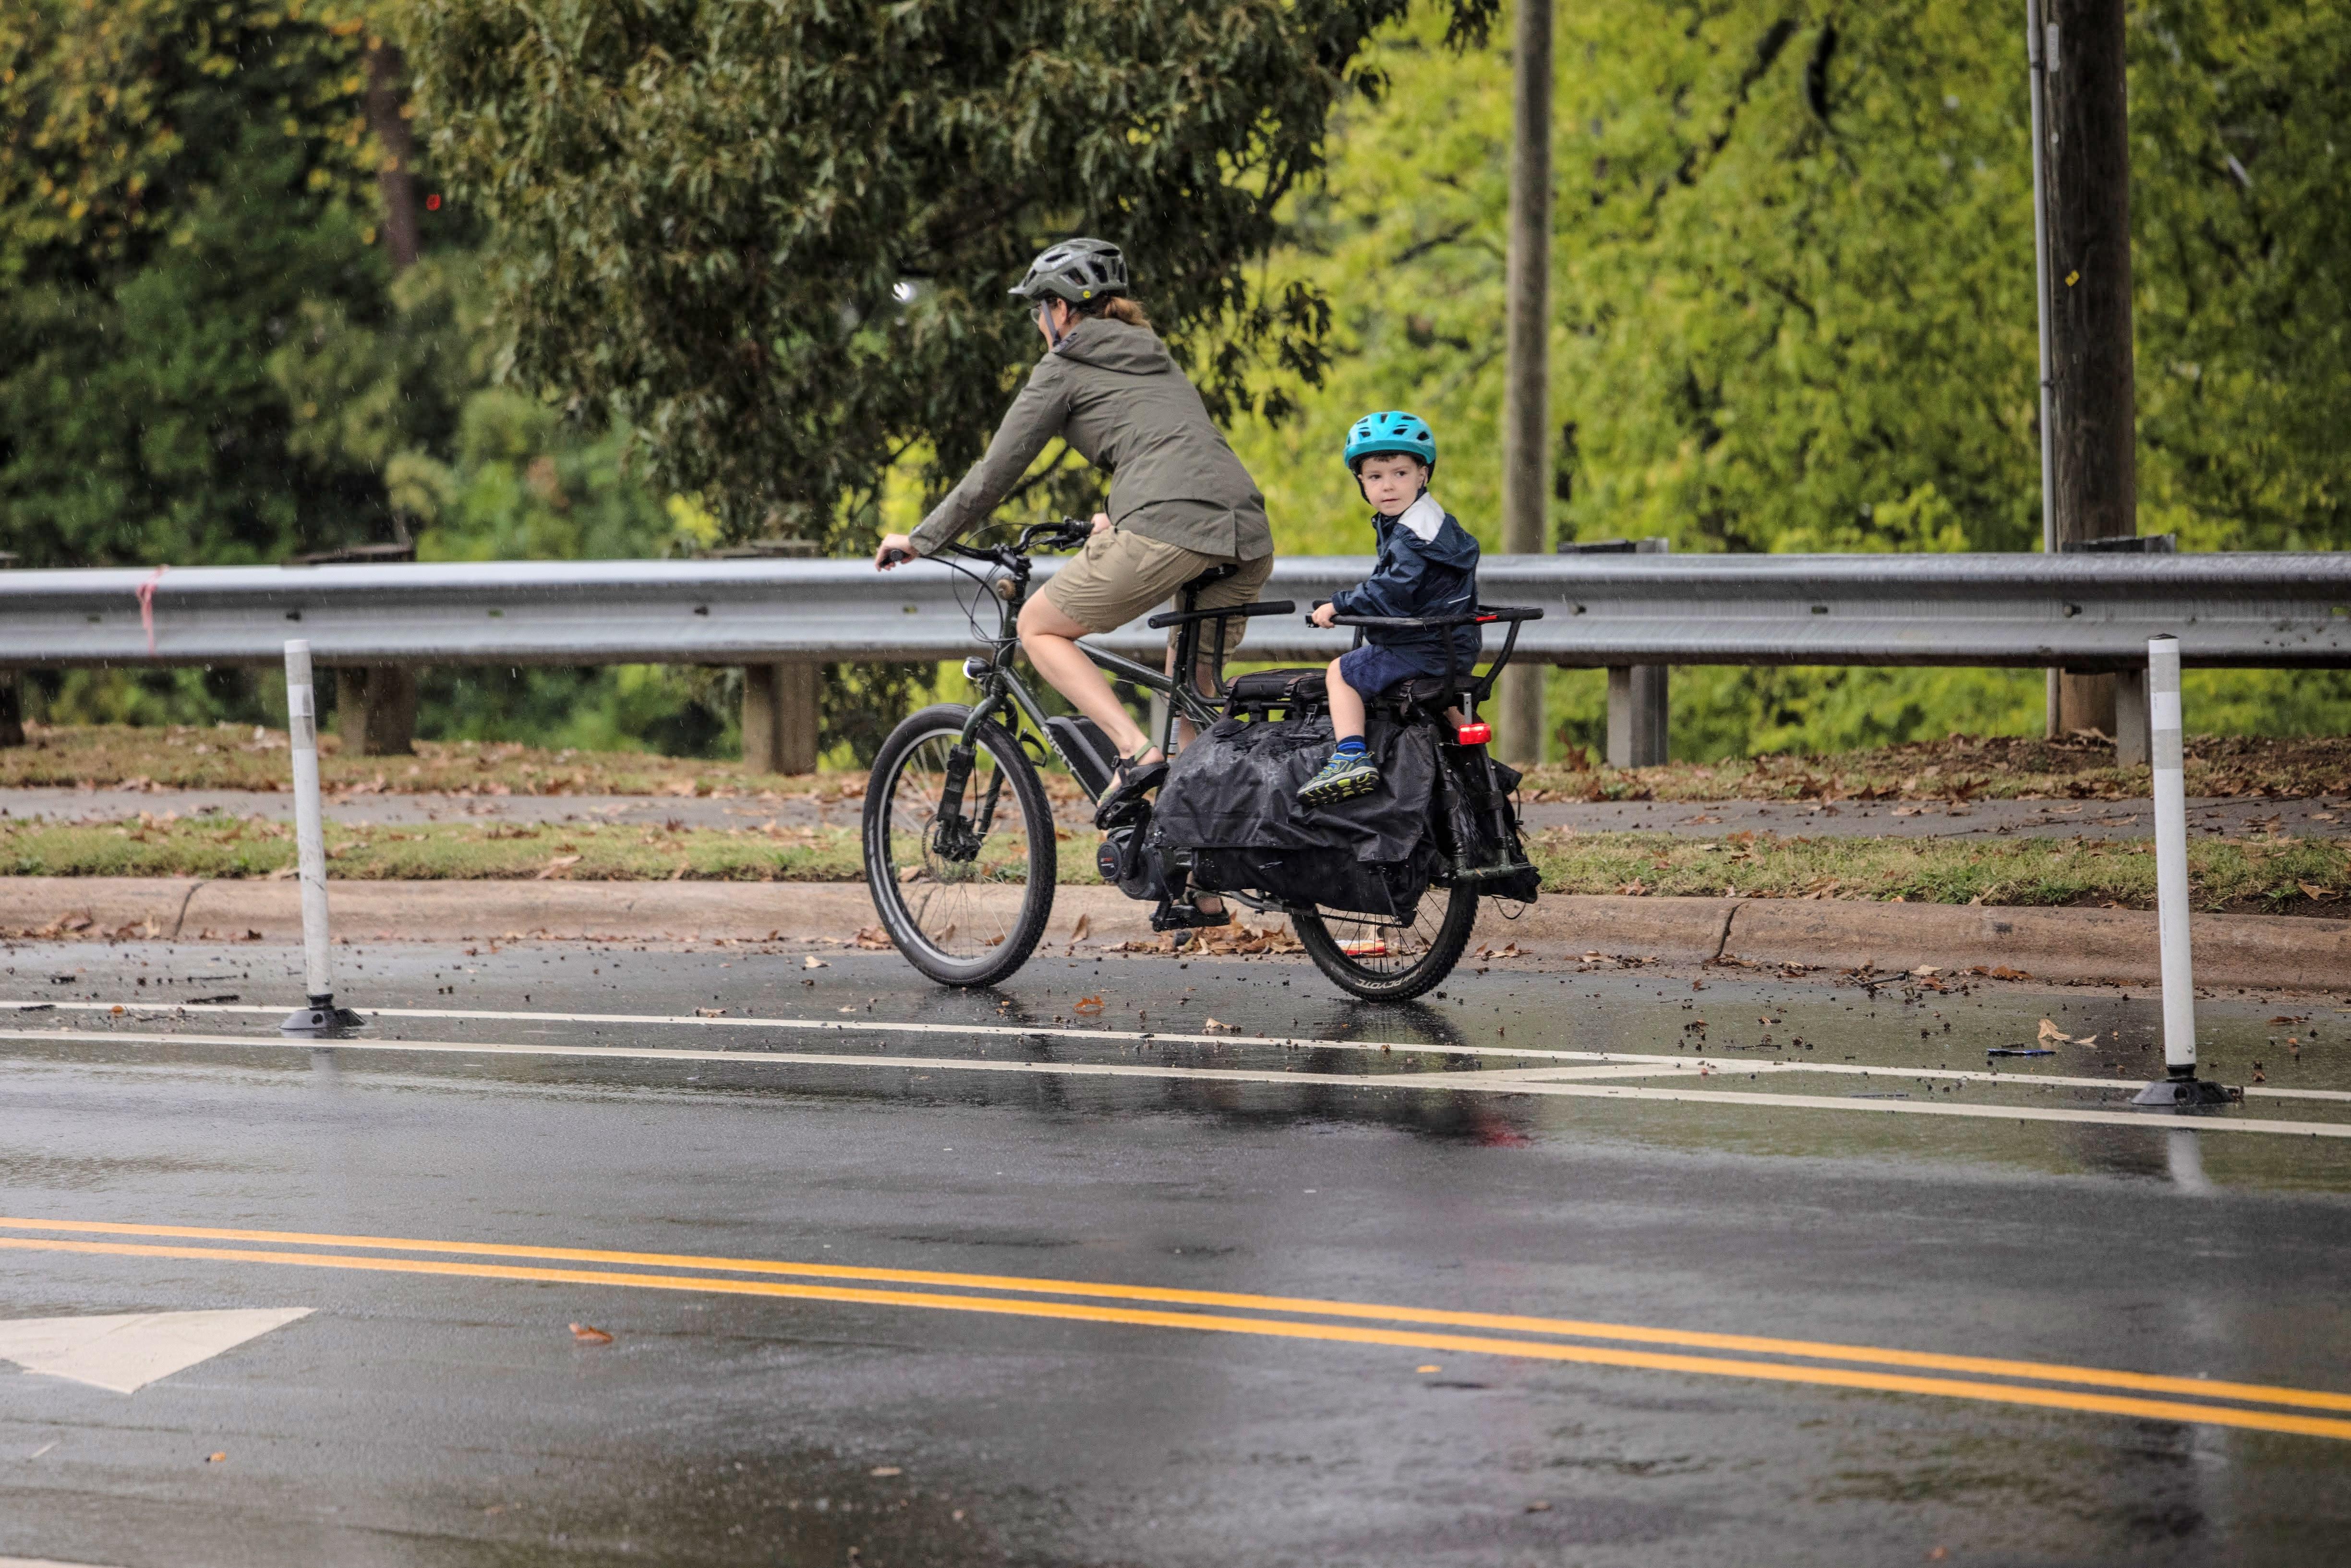 Parkwood_-_child_on_bike_-_Photographer_David_Flower.jpg